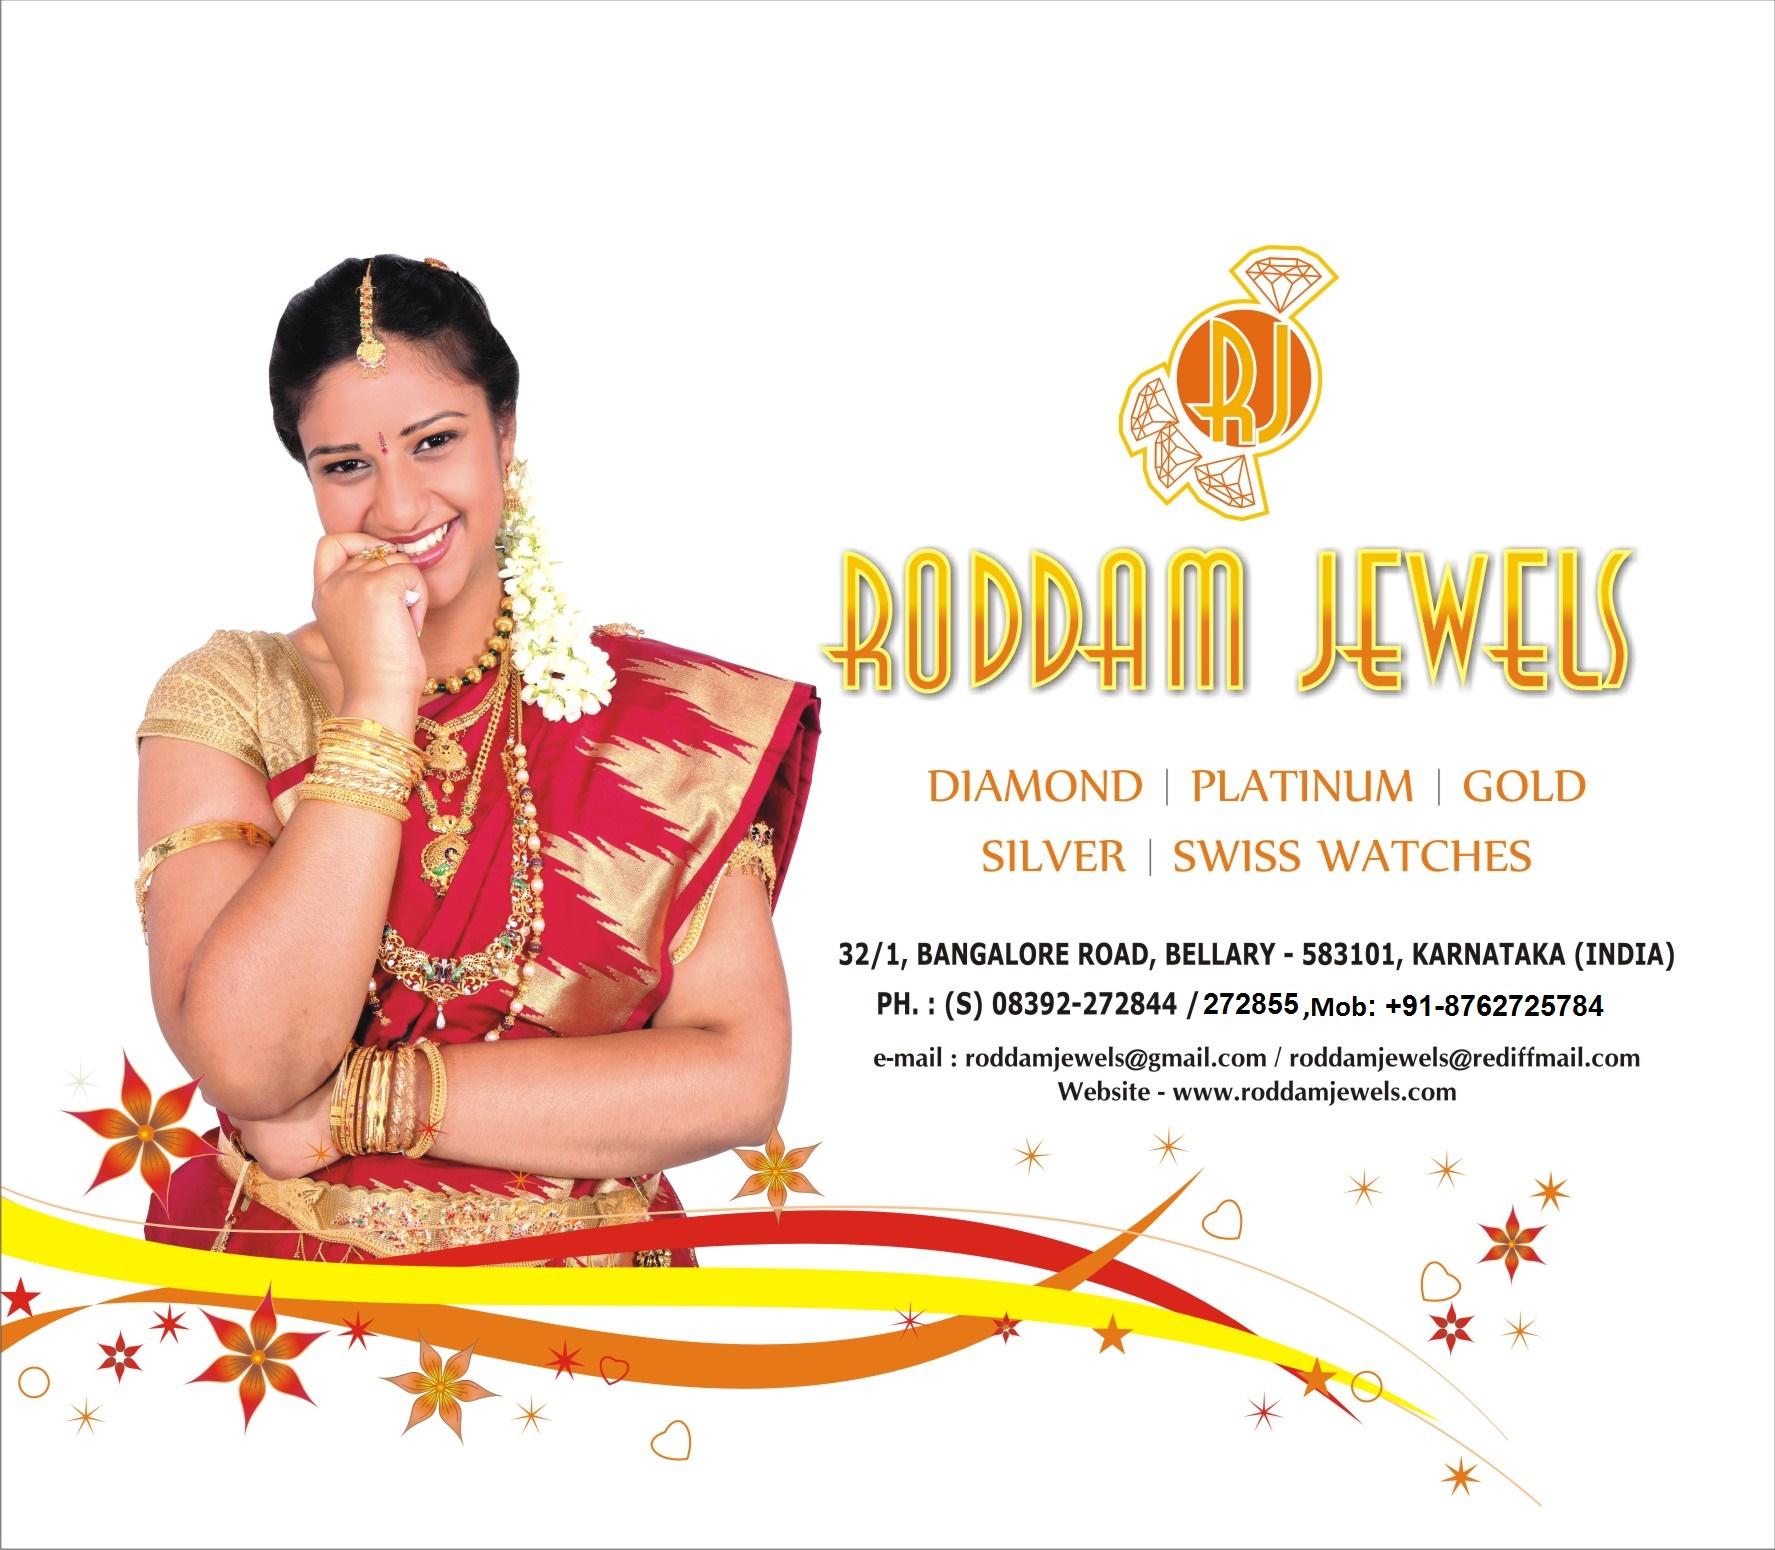 Roddam Jewels